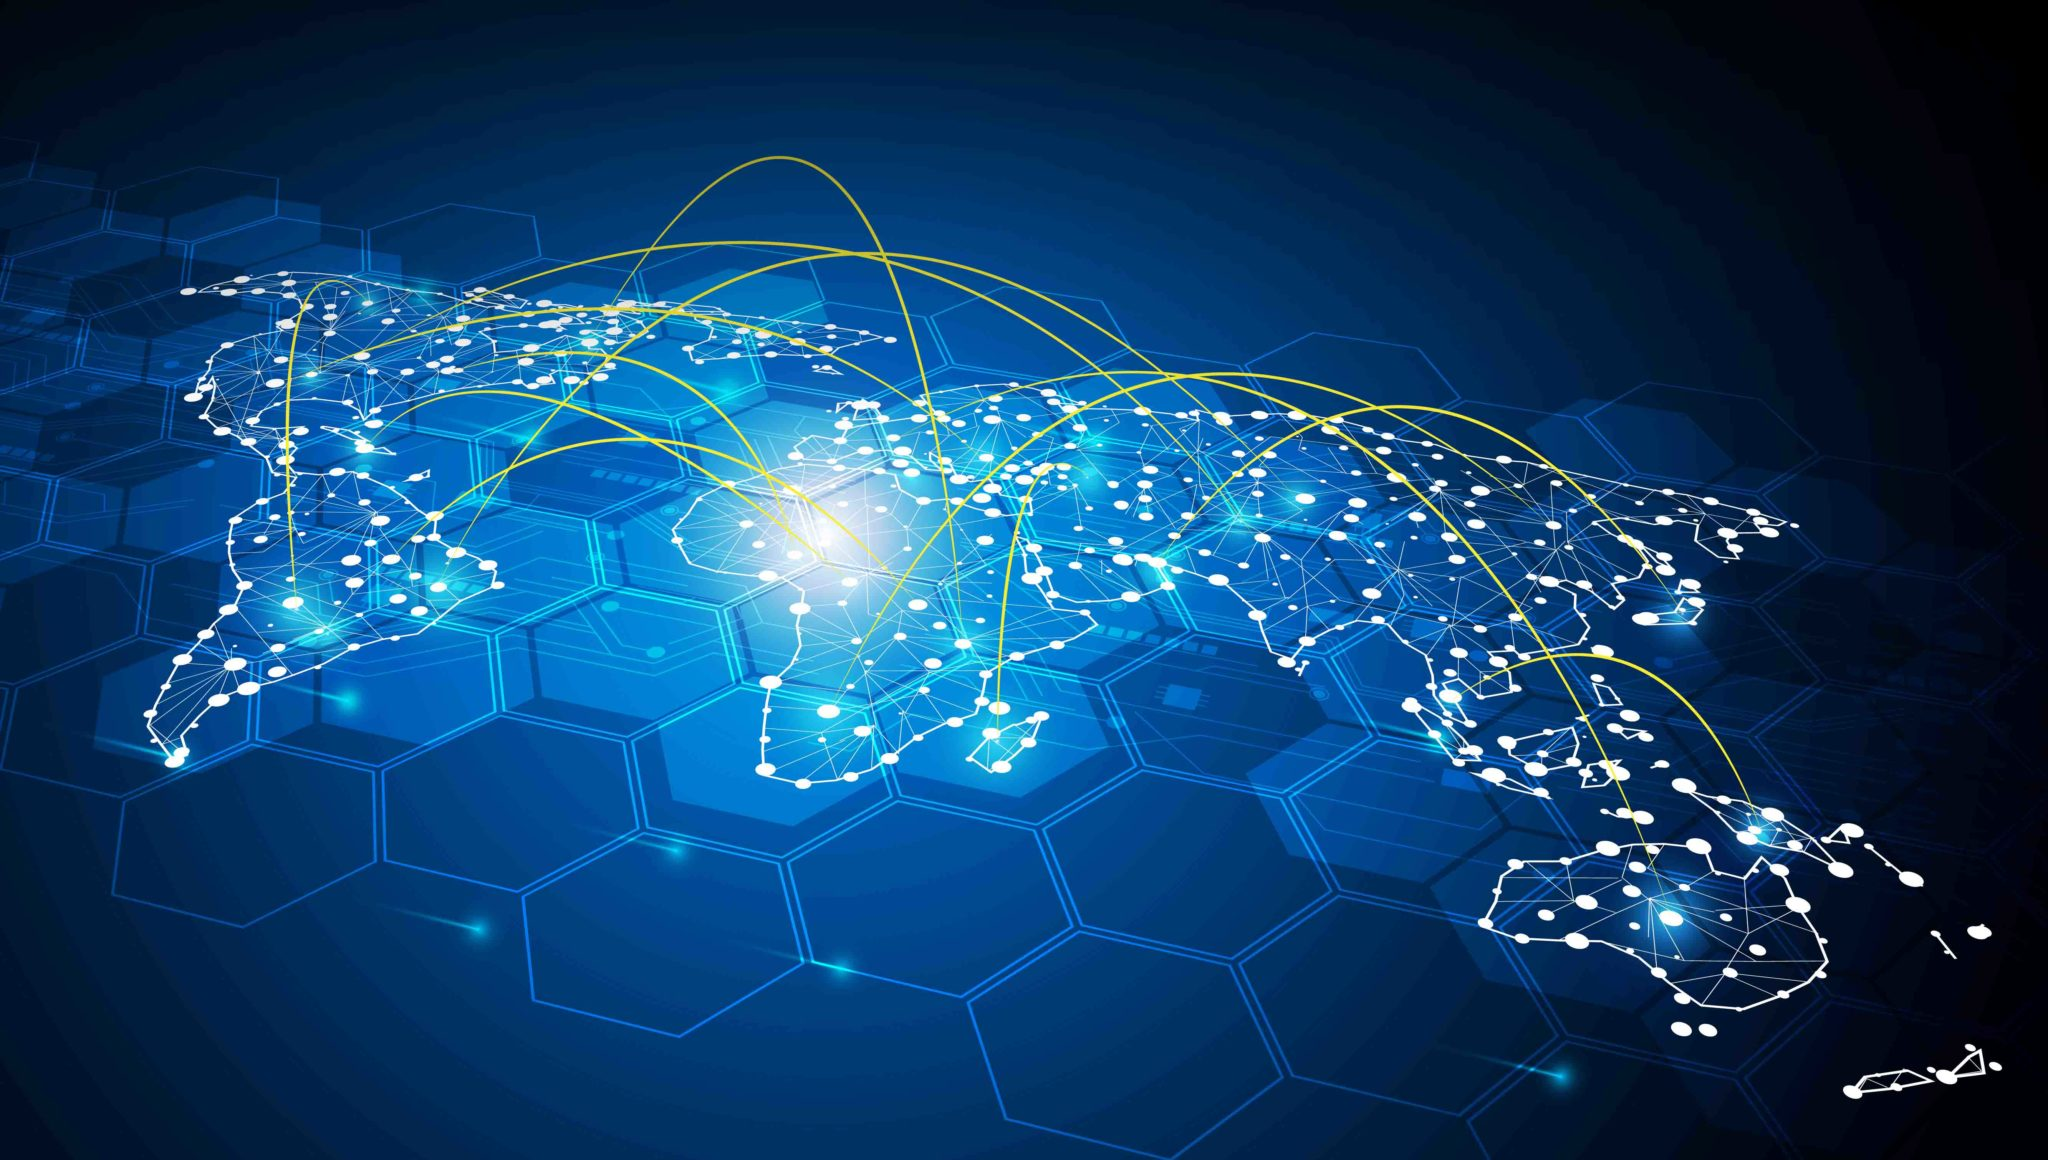 Kerlink, Tata ink deal to deploy LoRaWAN IoT networks globally